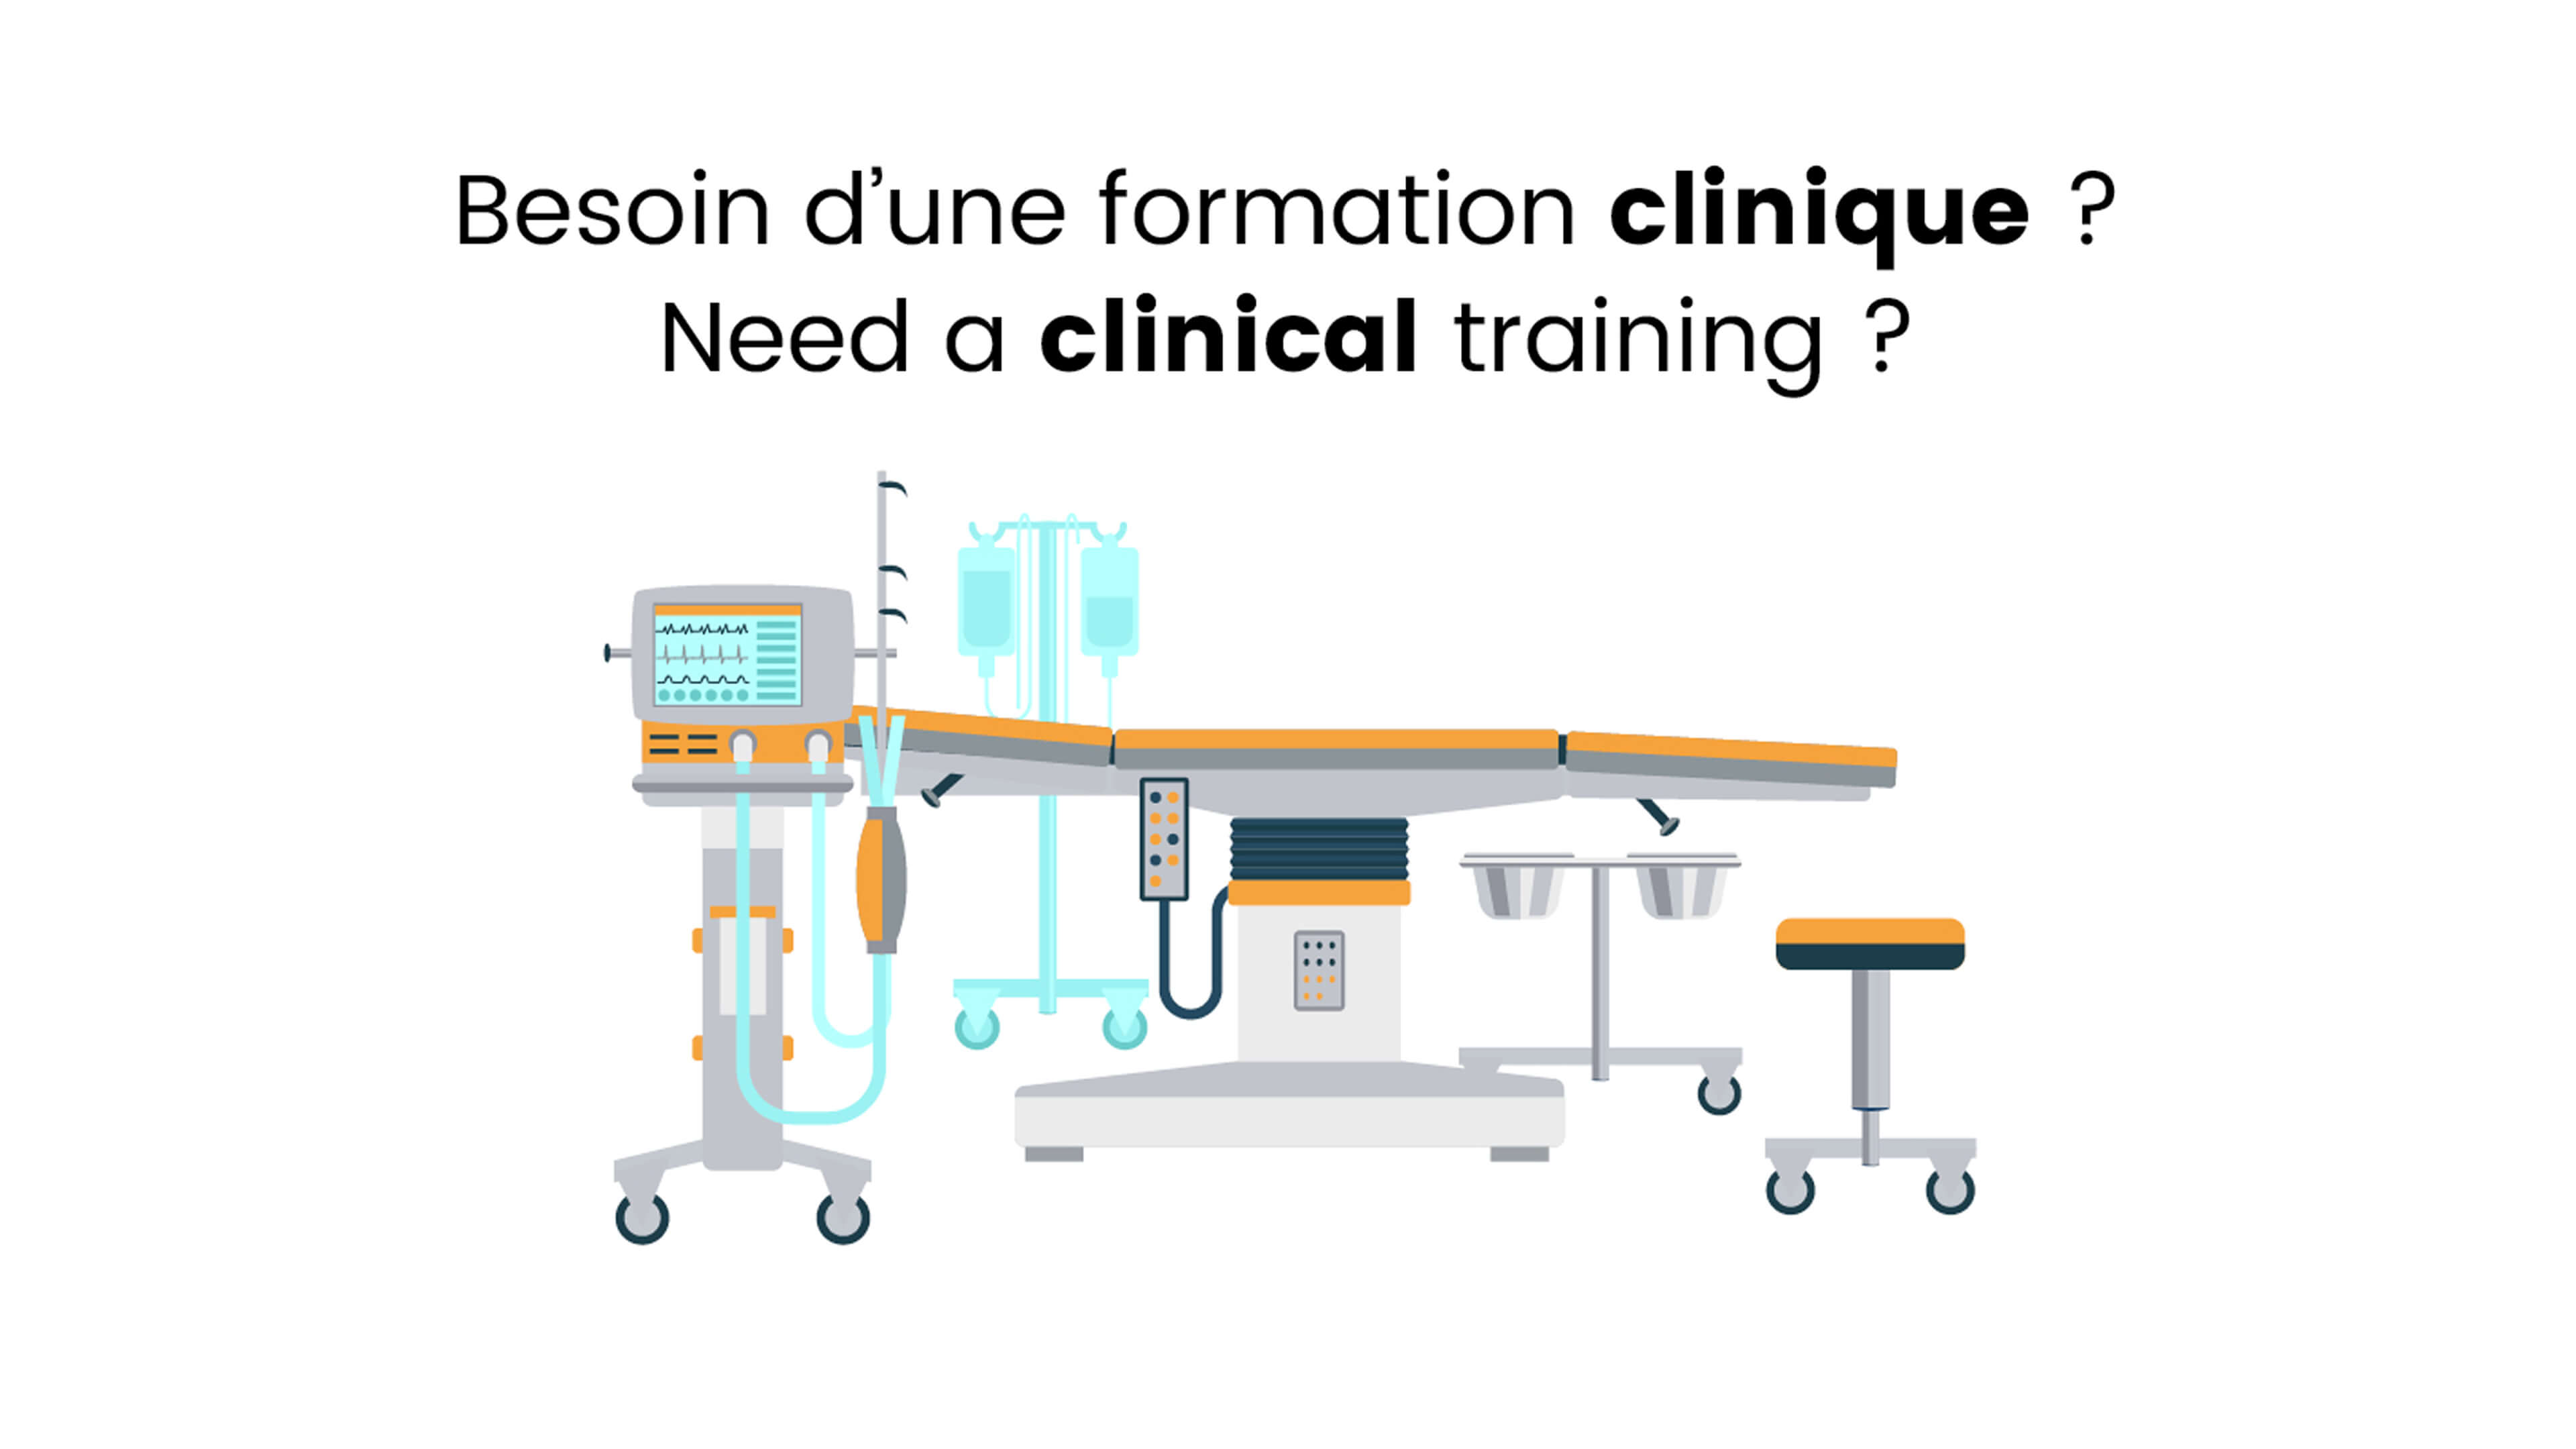 Besoin d'une formation clinique ?